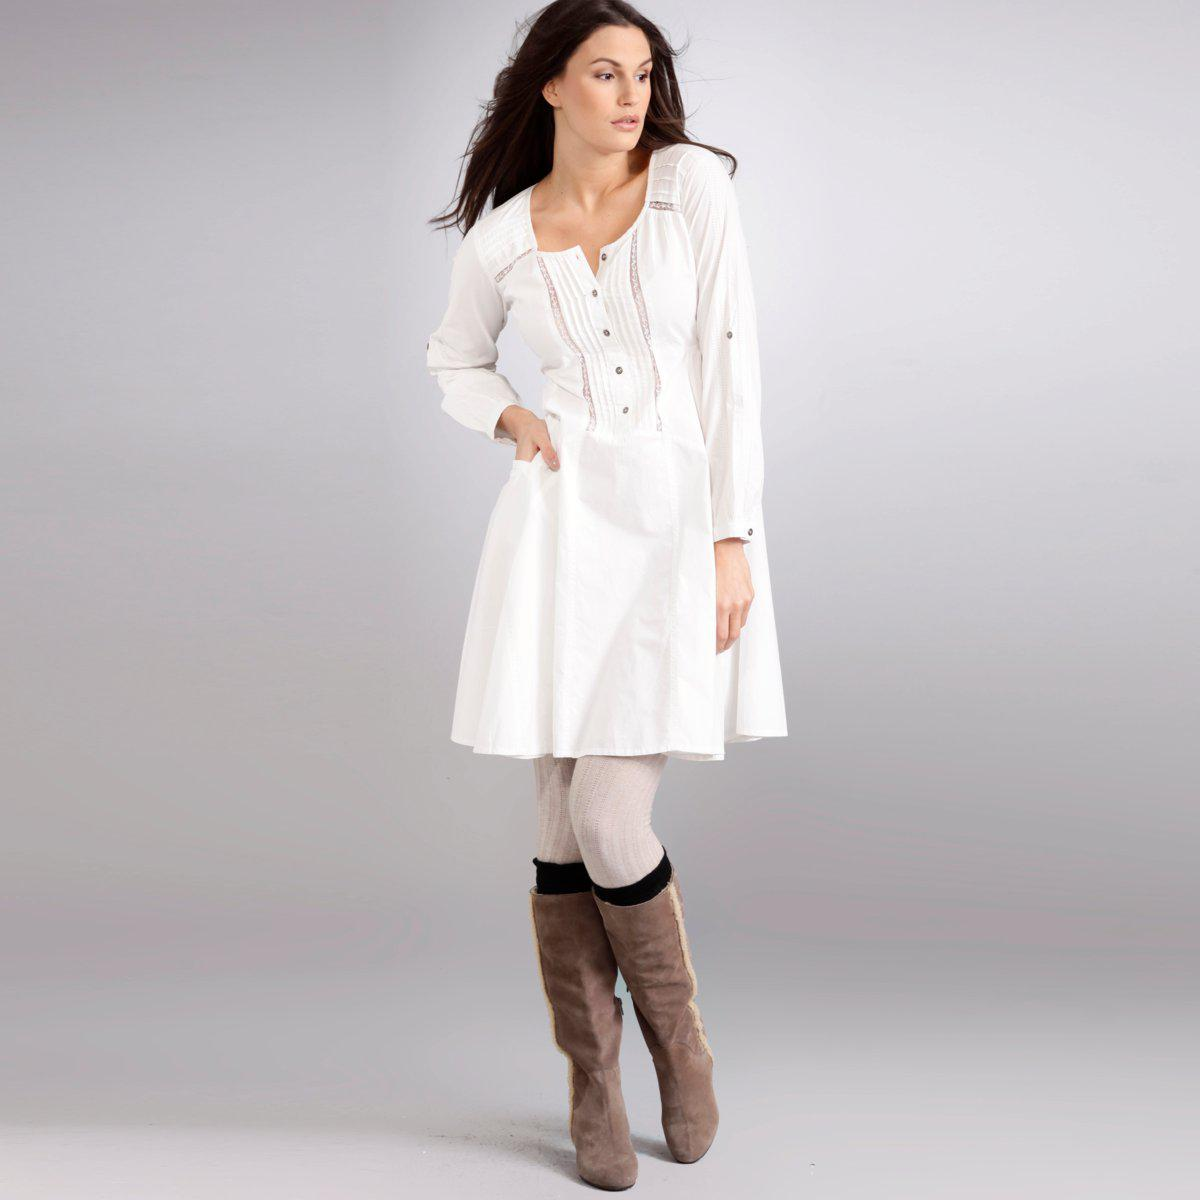 bradyna foremata 268 - Βραδυνα Φορεματα LaRedoute Χειμώνας 2012 Κωδ. 324206606